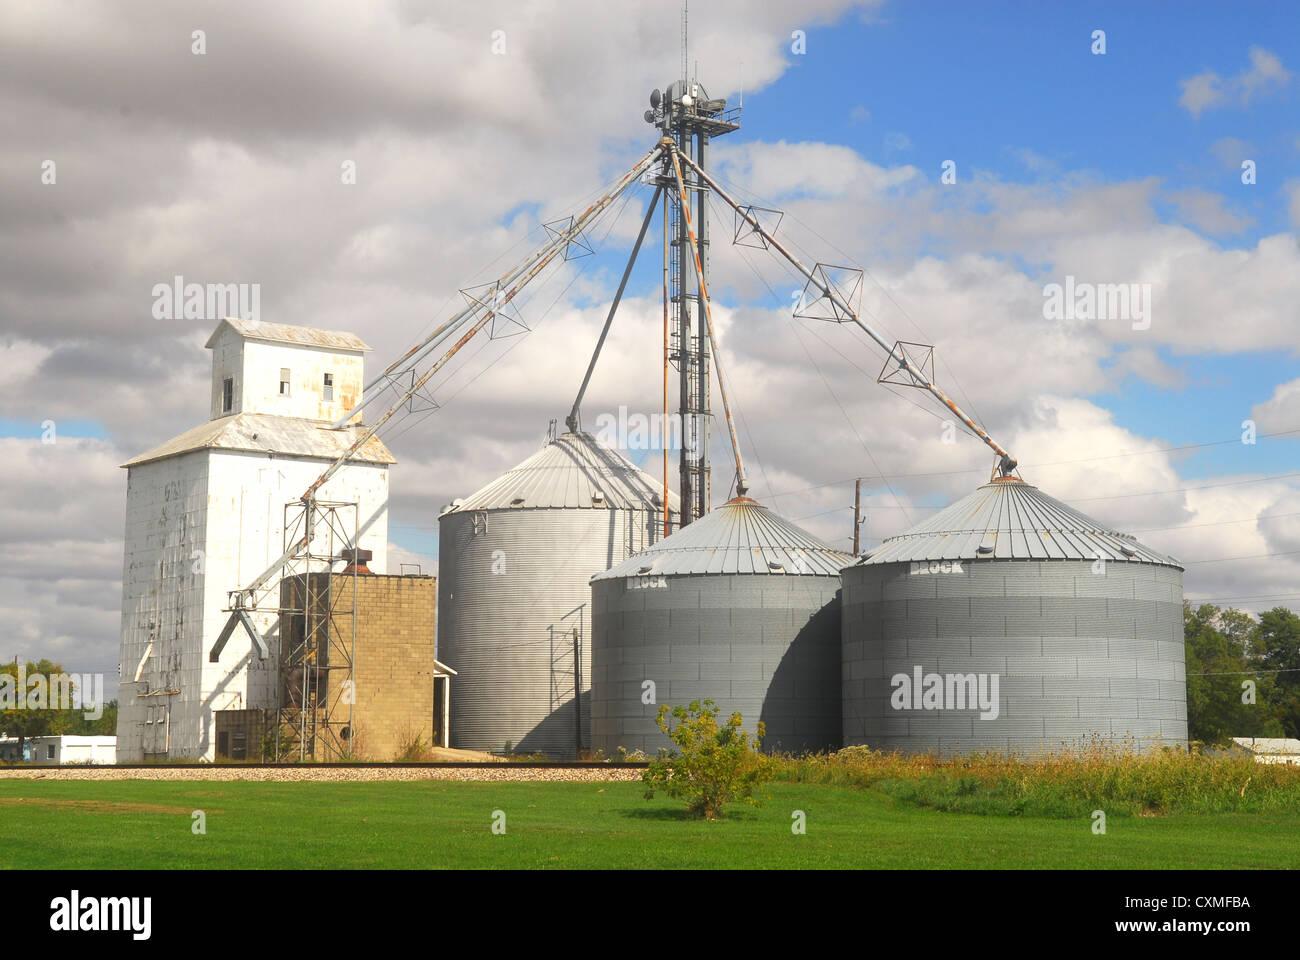 Farming silos along historic Route 66 in Illinois - Stock Image